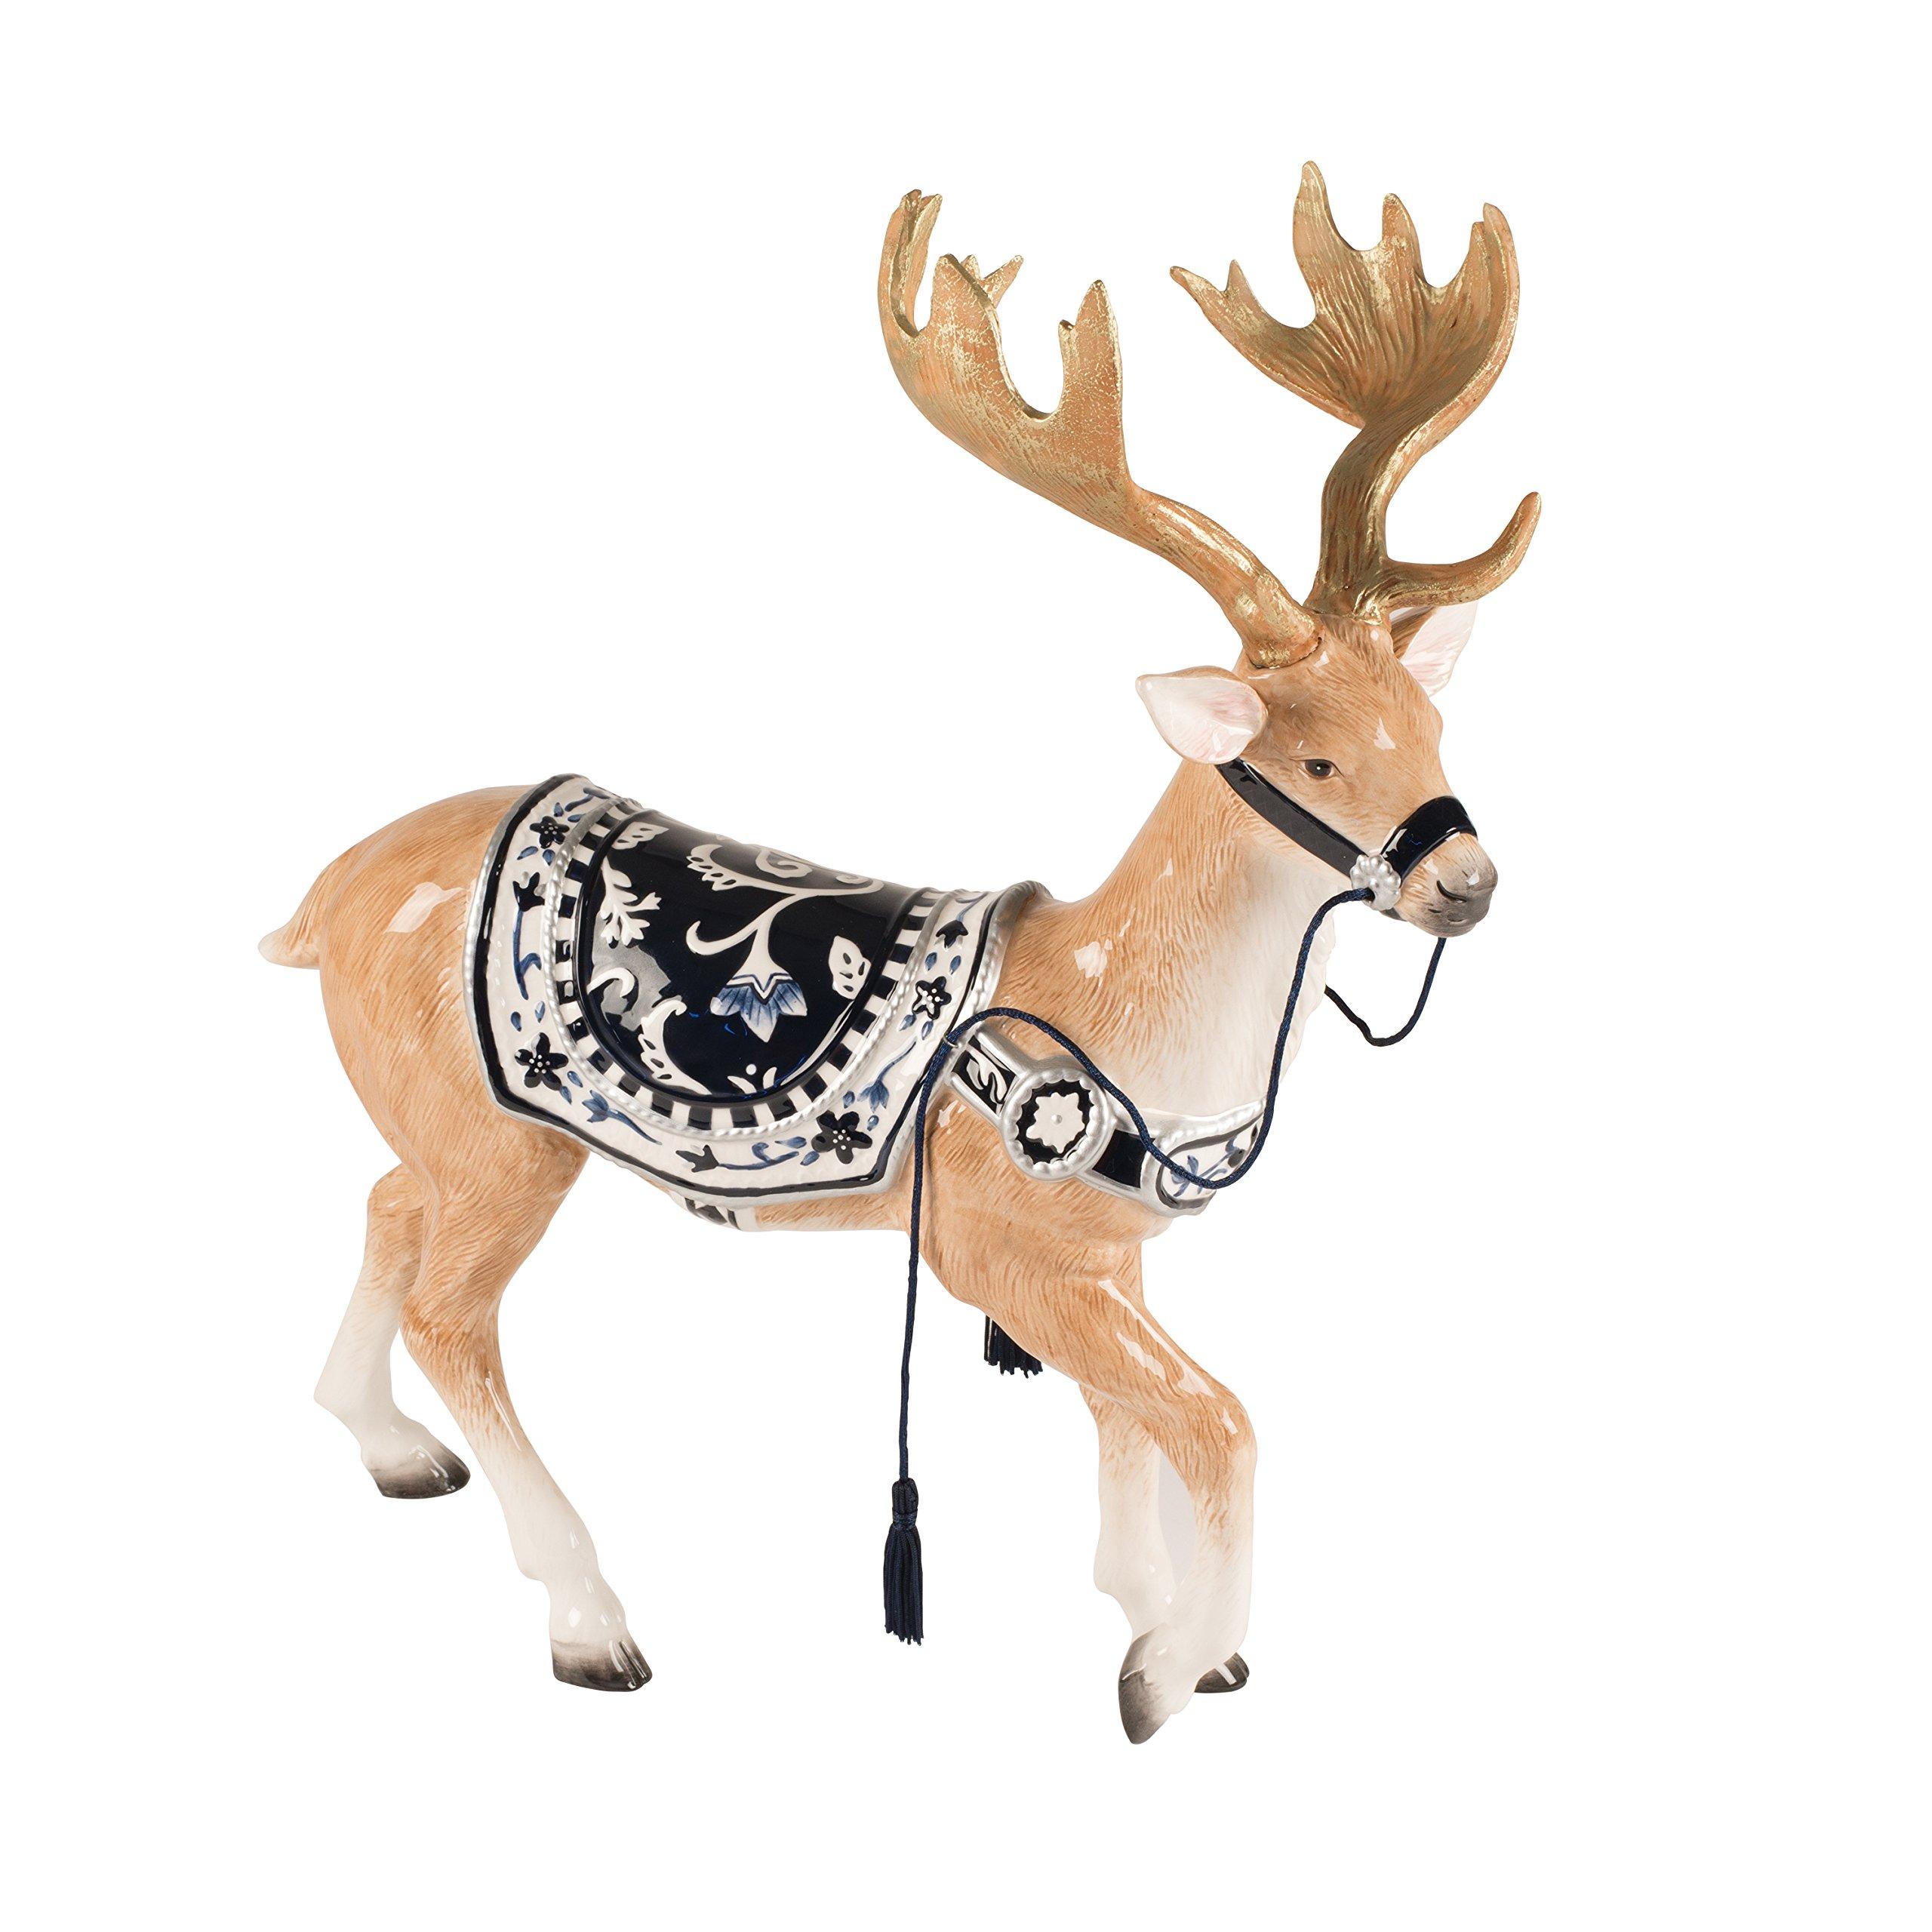 Fitz and Floyd Bristol Holiday Deer Figurine, Blue/White